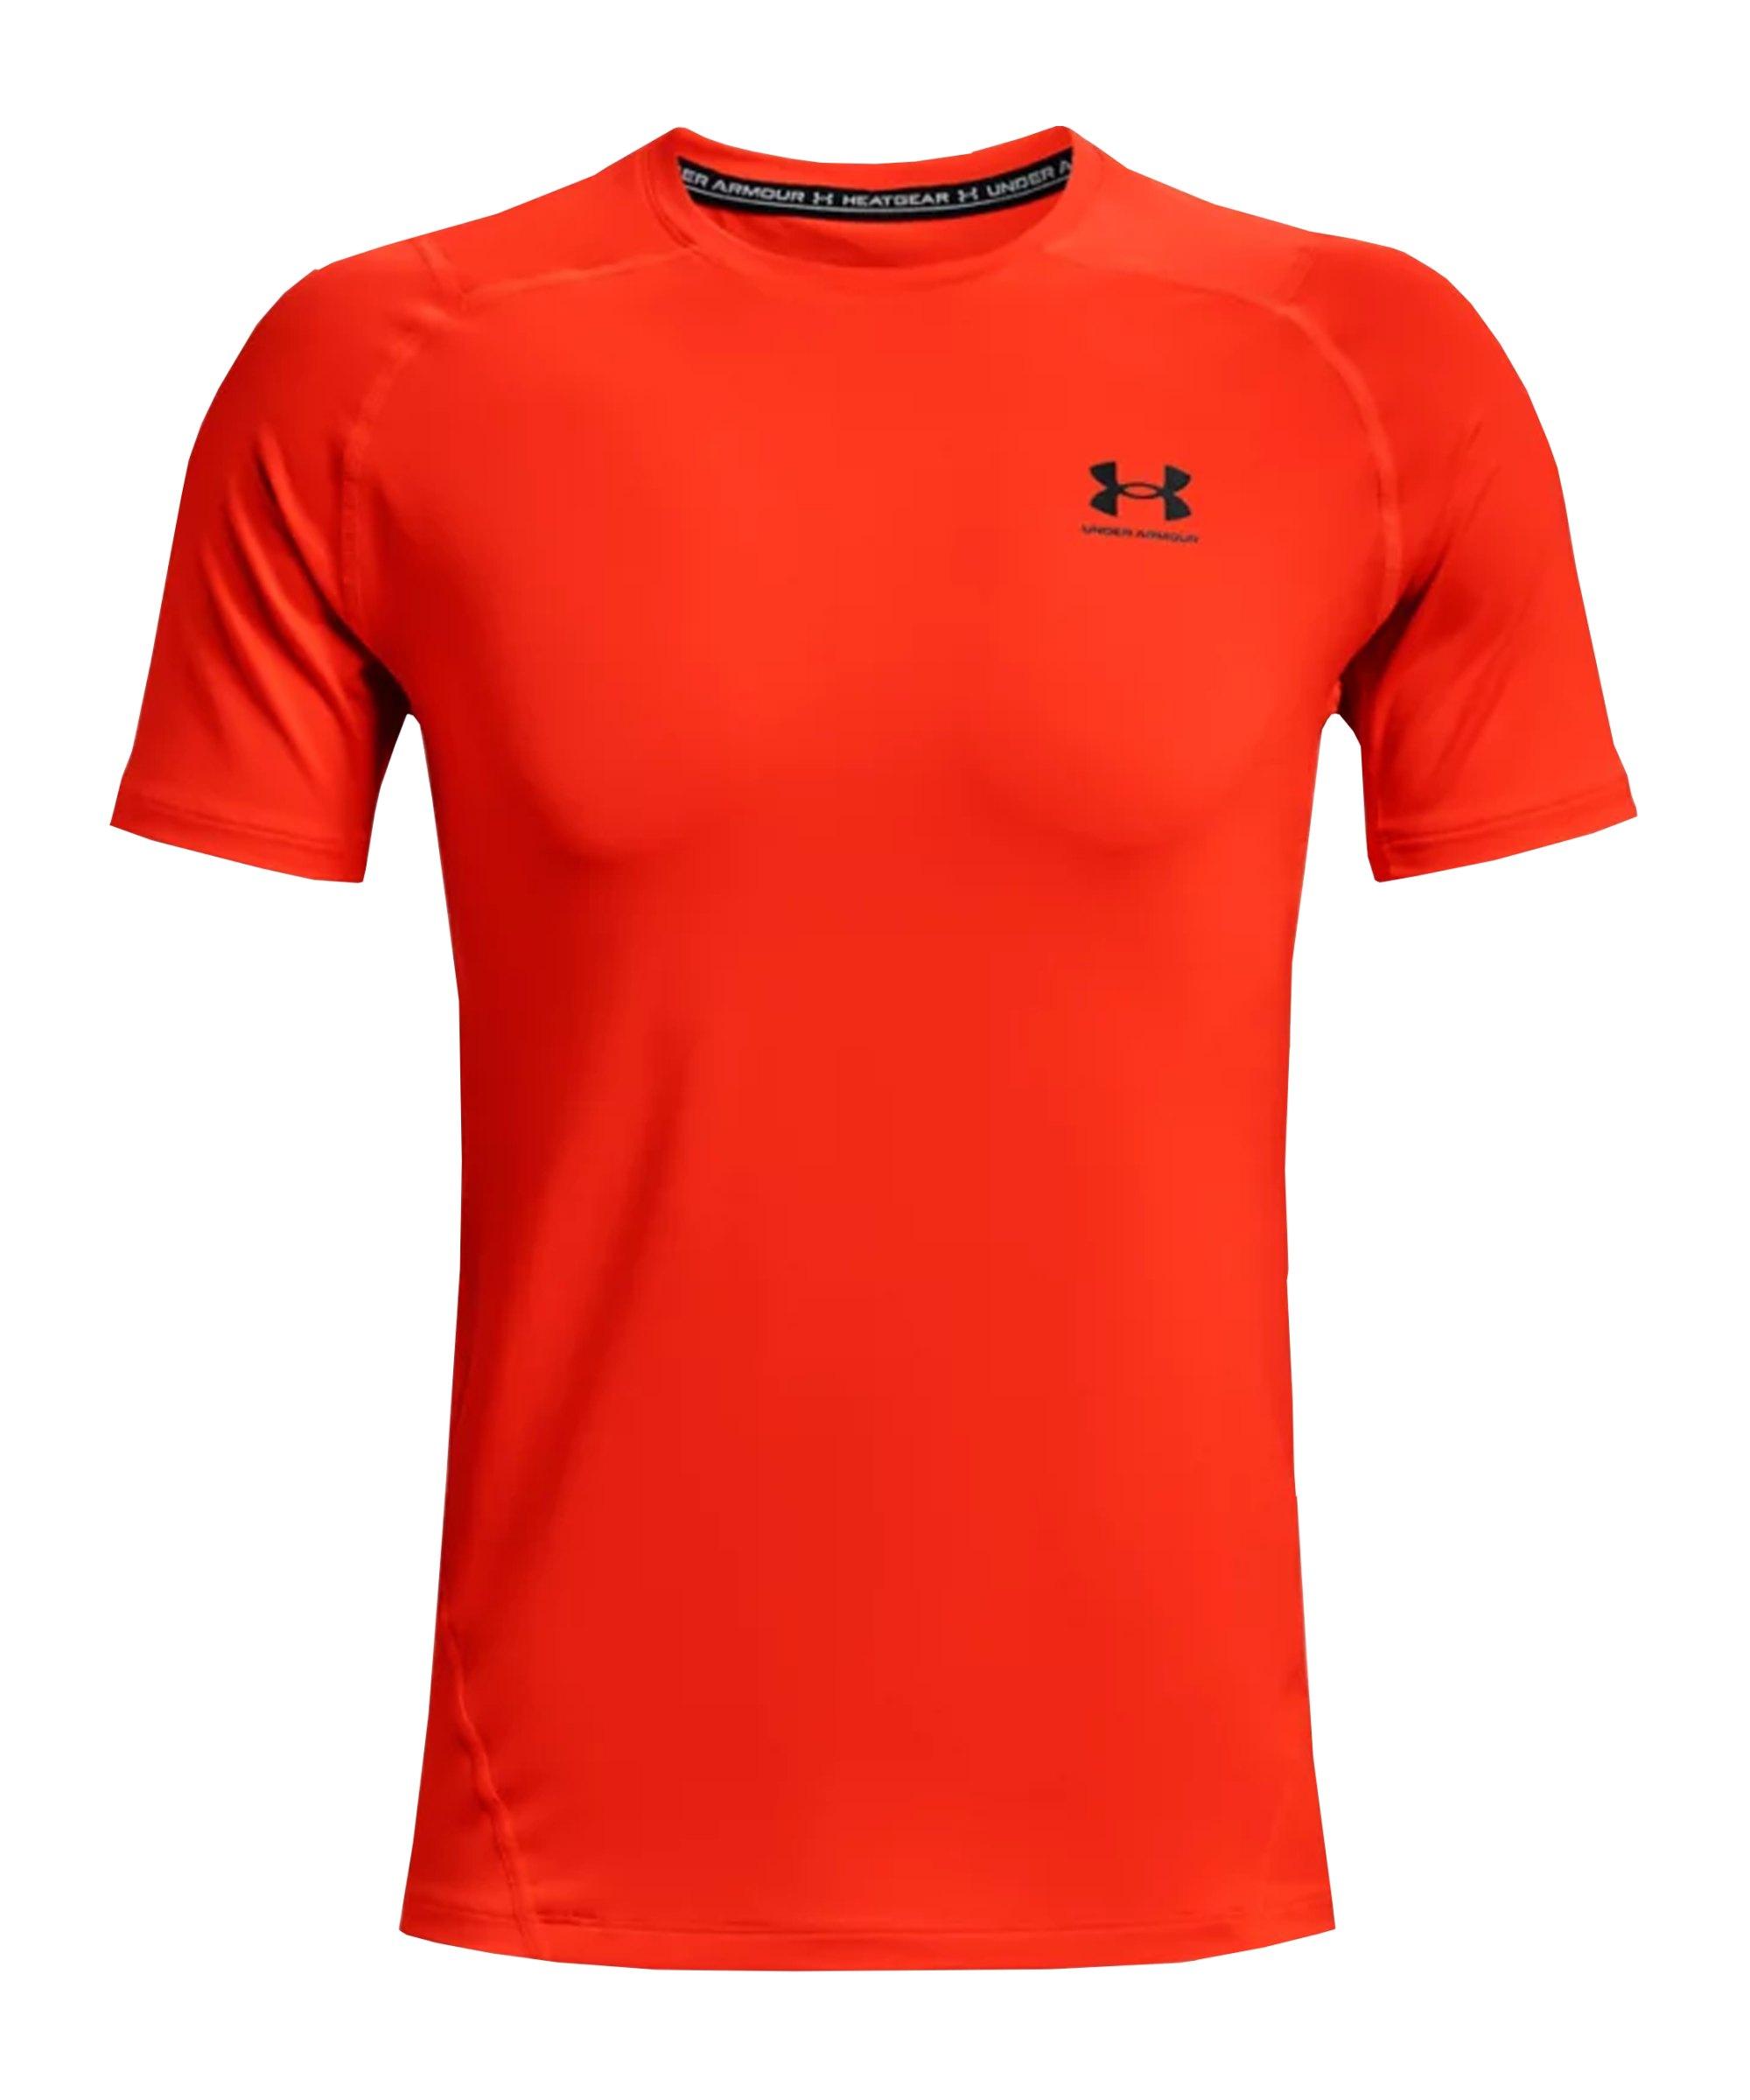 Under Armour HG Fitted T-Shirt Orange F296 - orange